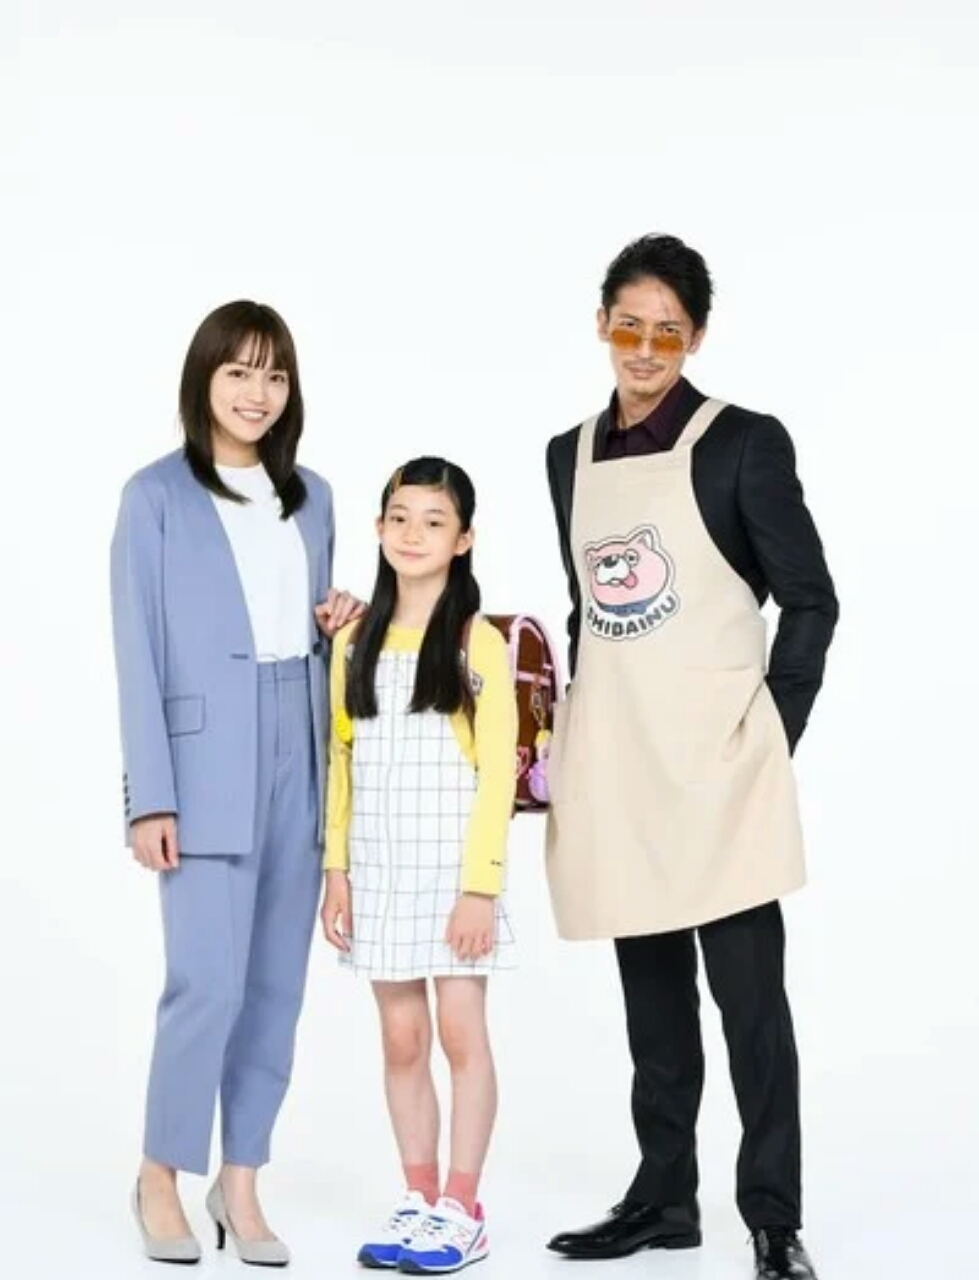 Live-Action The Way of the Househusband Memperkenalkan Karakter Anak Perempuan Orisinal 1